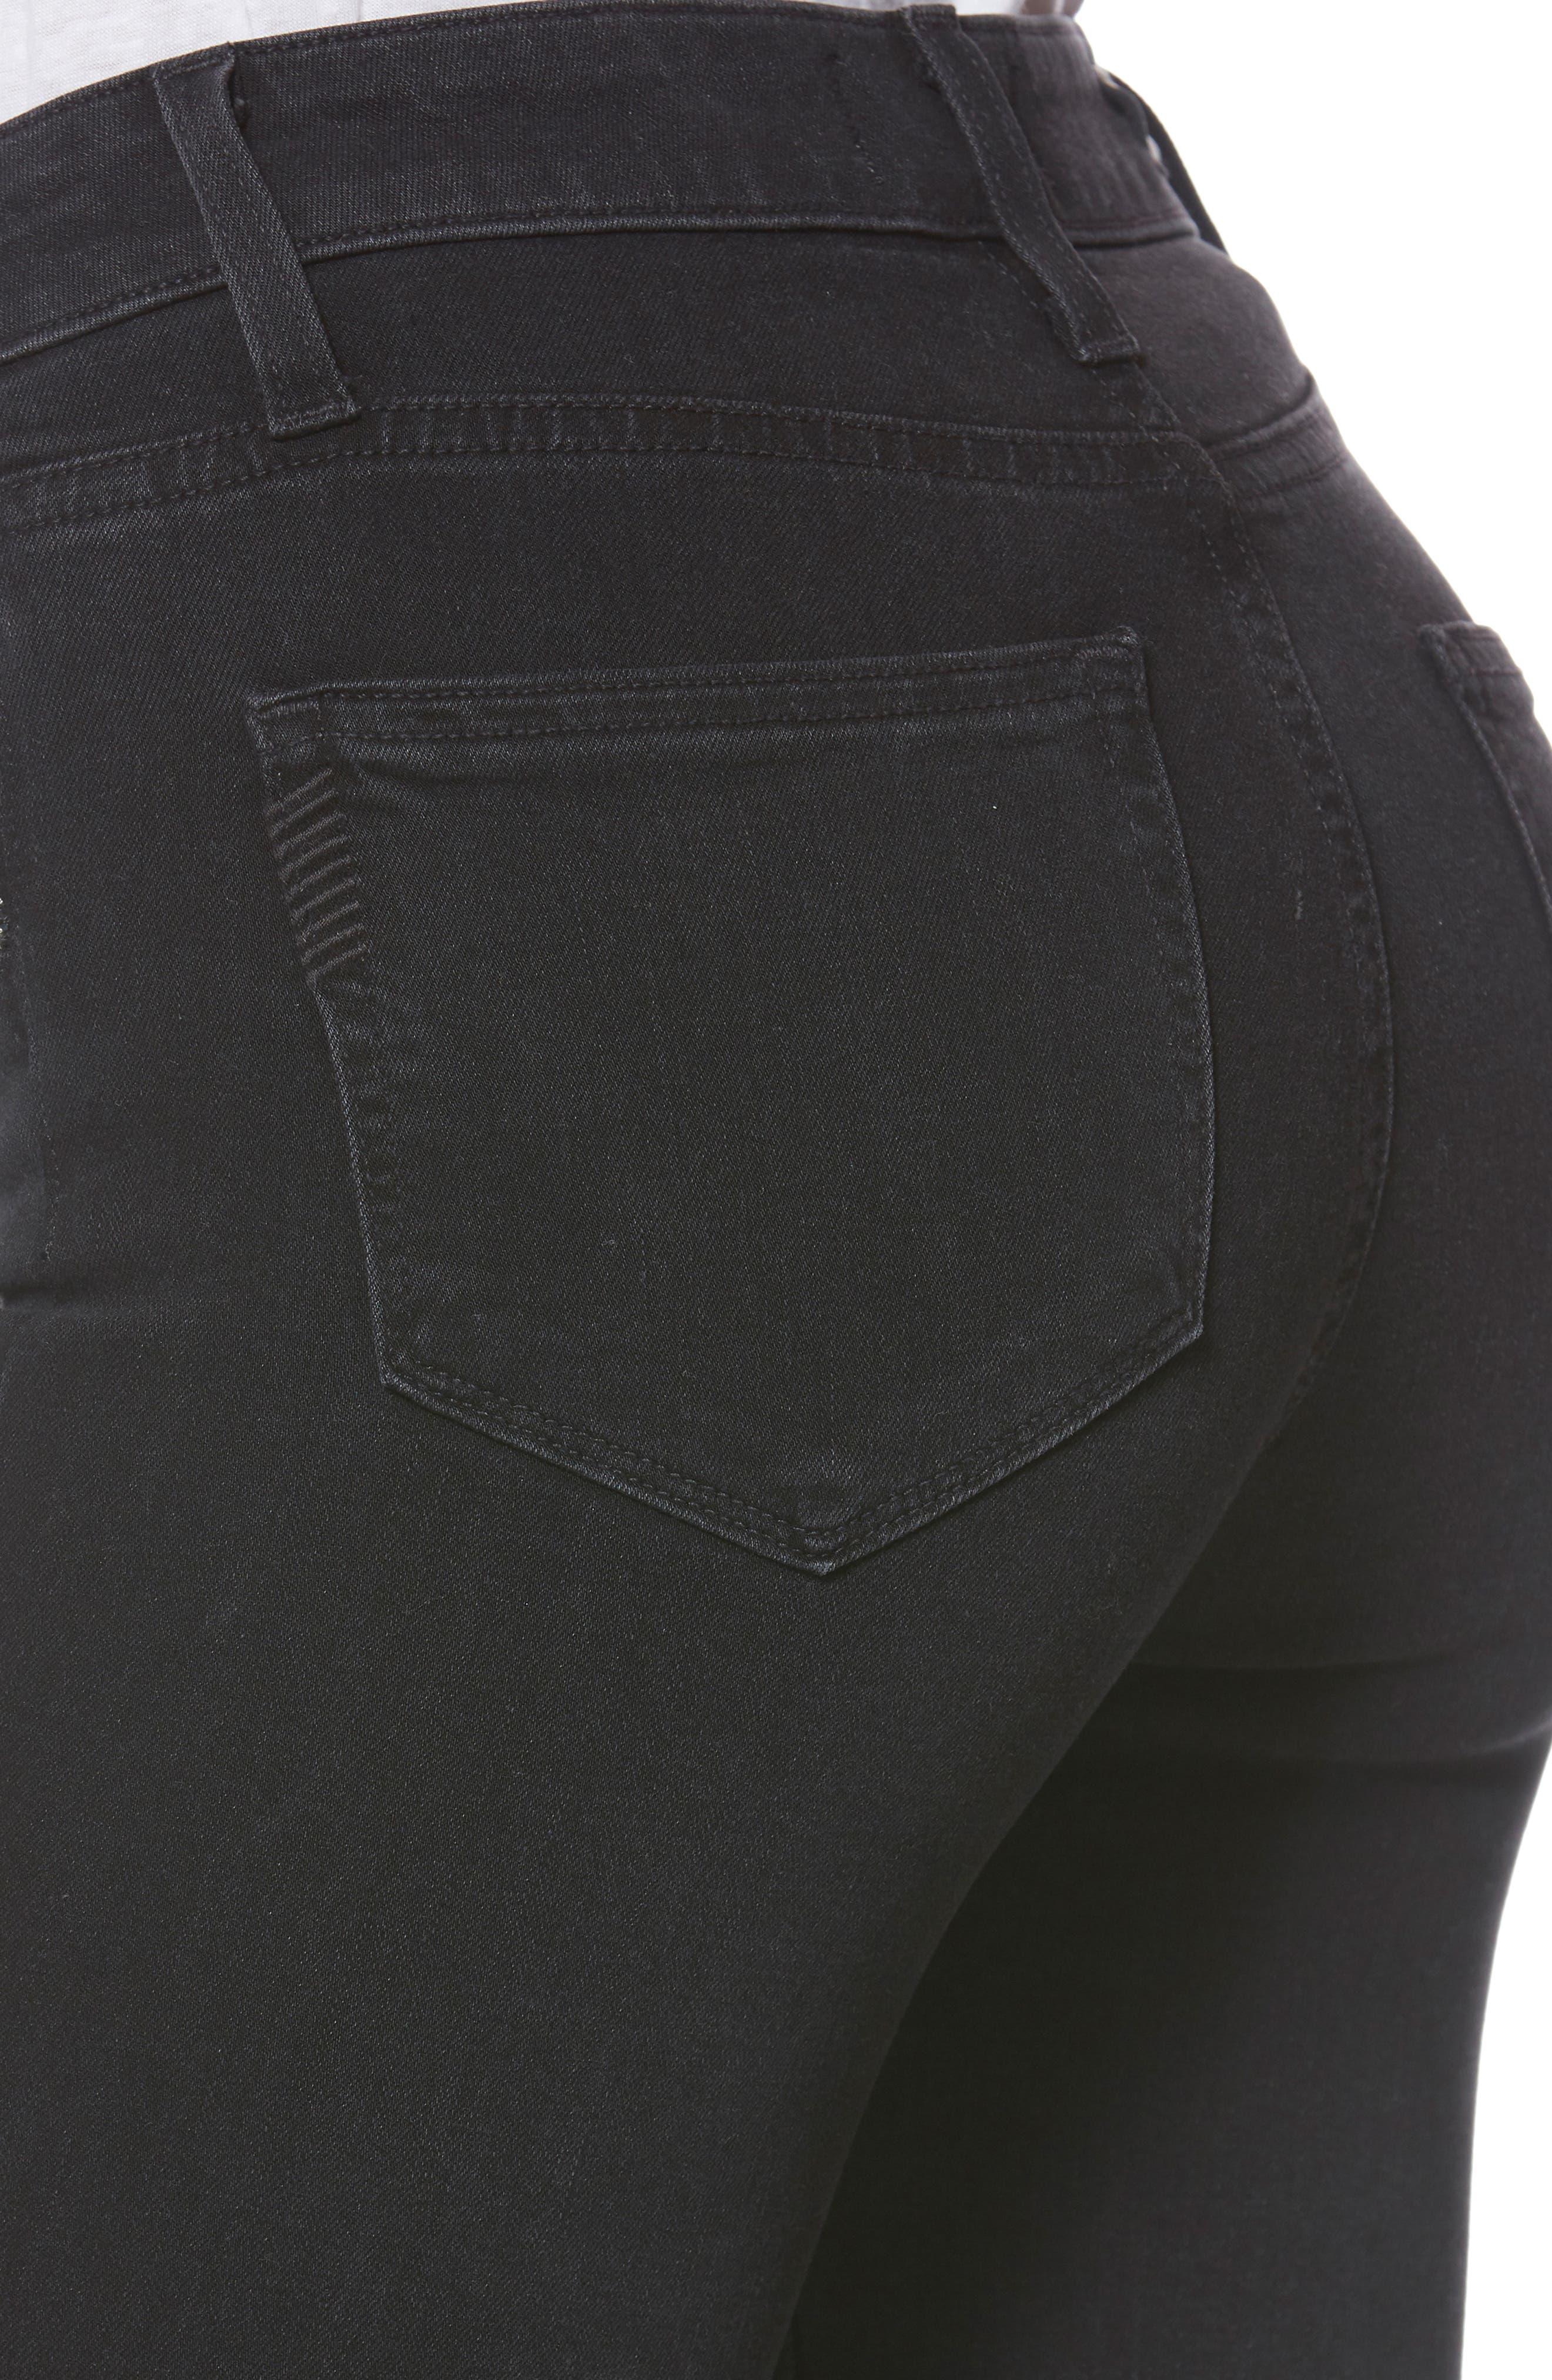 Transcend - Roxxi Zipper Teeth Jeans,                             Alternate thumbnail 4, color,                             001